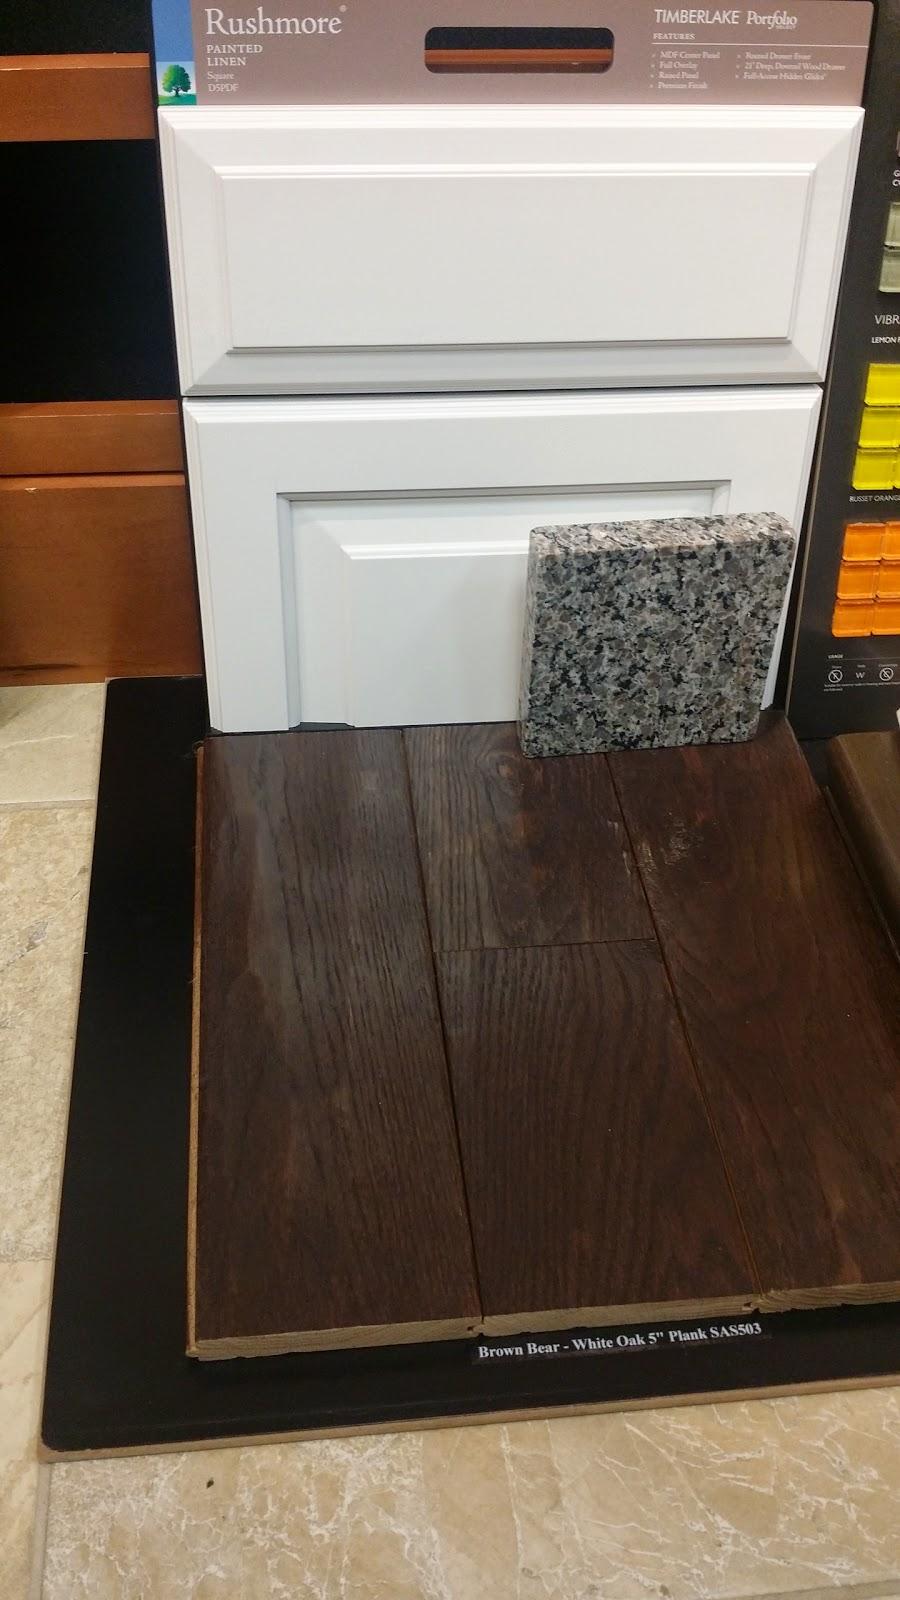 Generous 1 X 1 Ceiling Tiles Huge 12X12 Ceramic Tiles Regular 13X13 Floor Tile 2 X4 Ceiling Tiles Young 2X4 Drop Ceiling Tiles Gray2X6 Subway Tile Living With An Elizabeth: A Ryan Home Construction Blog: Flooring ..